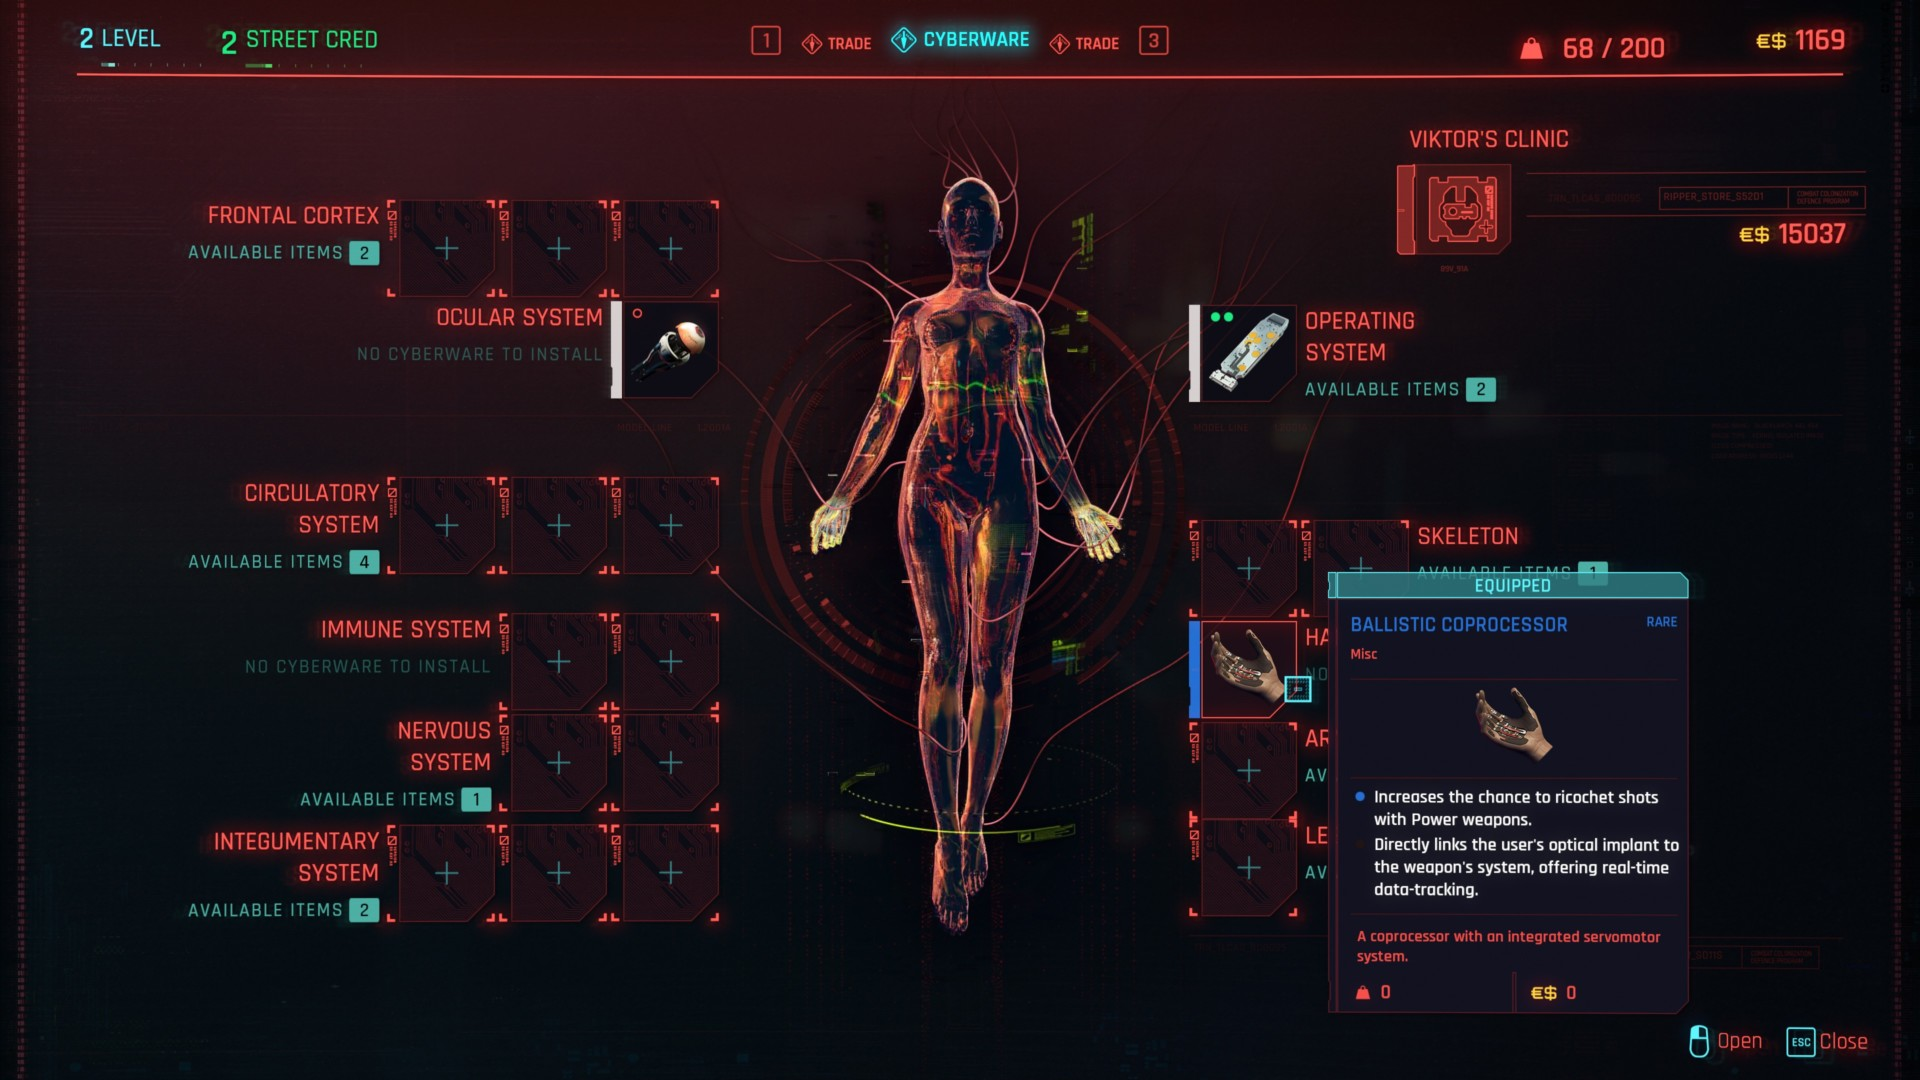 Cyberware Upgrades To Take Or Avoid In Cyberpunk 2077